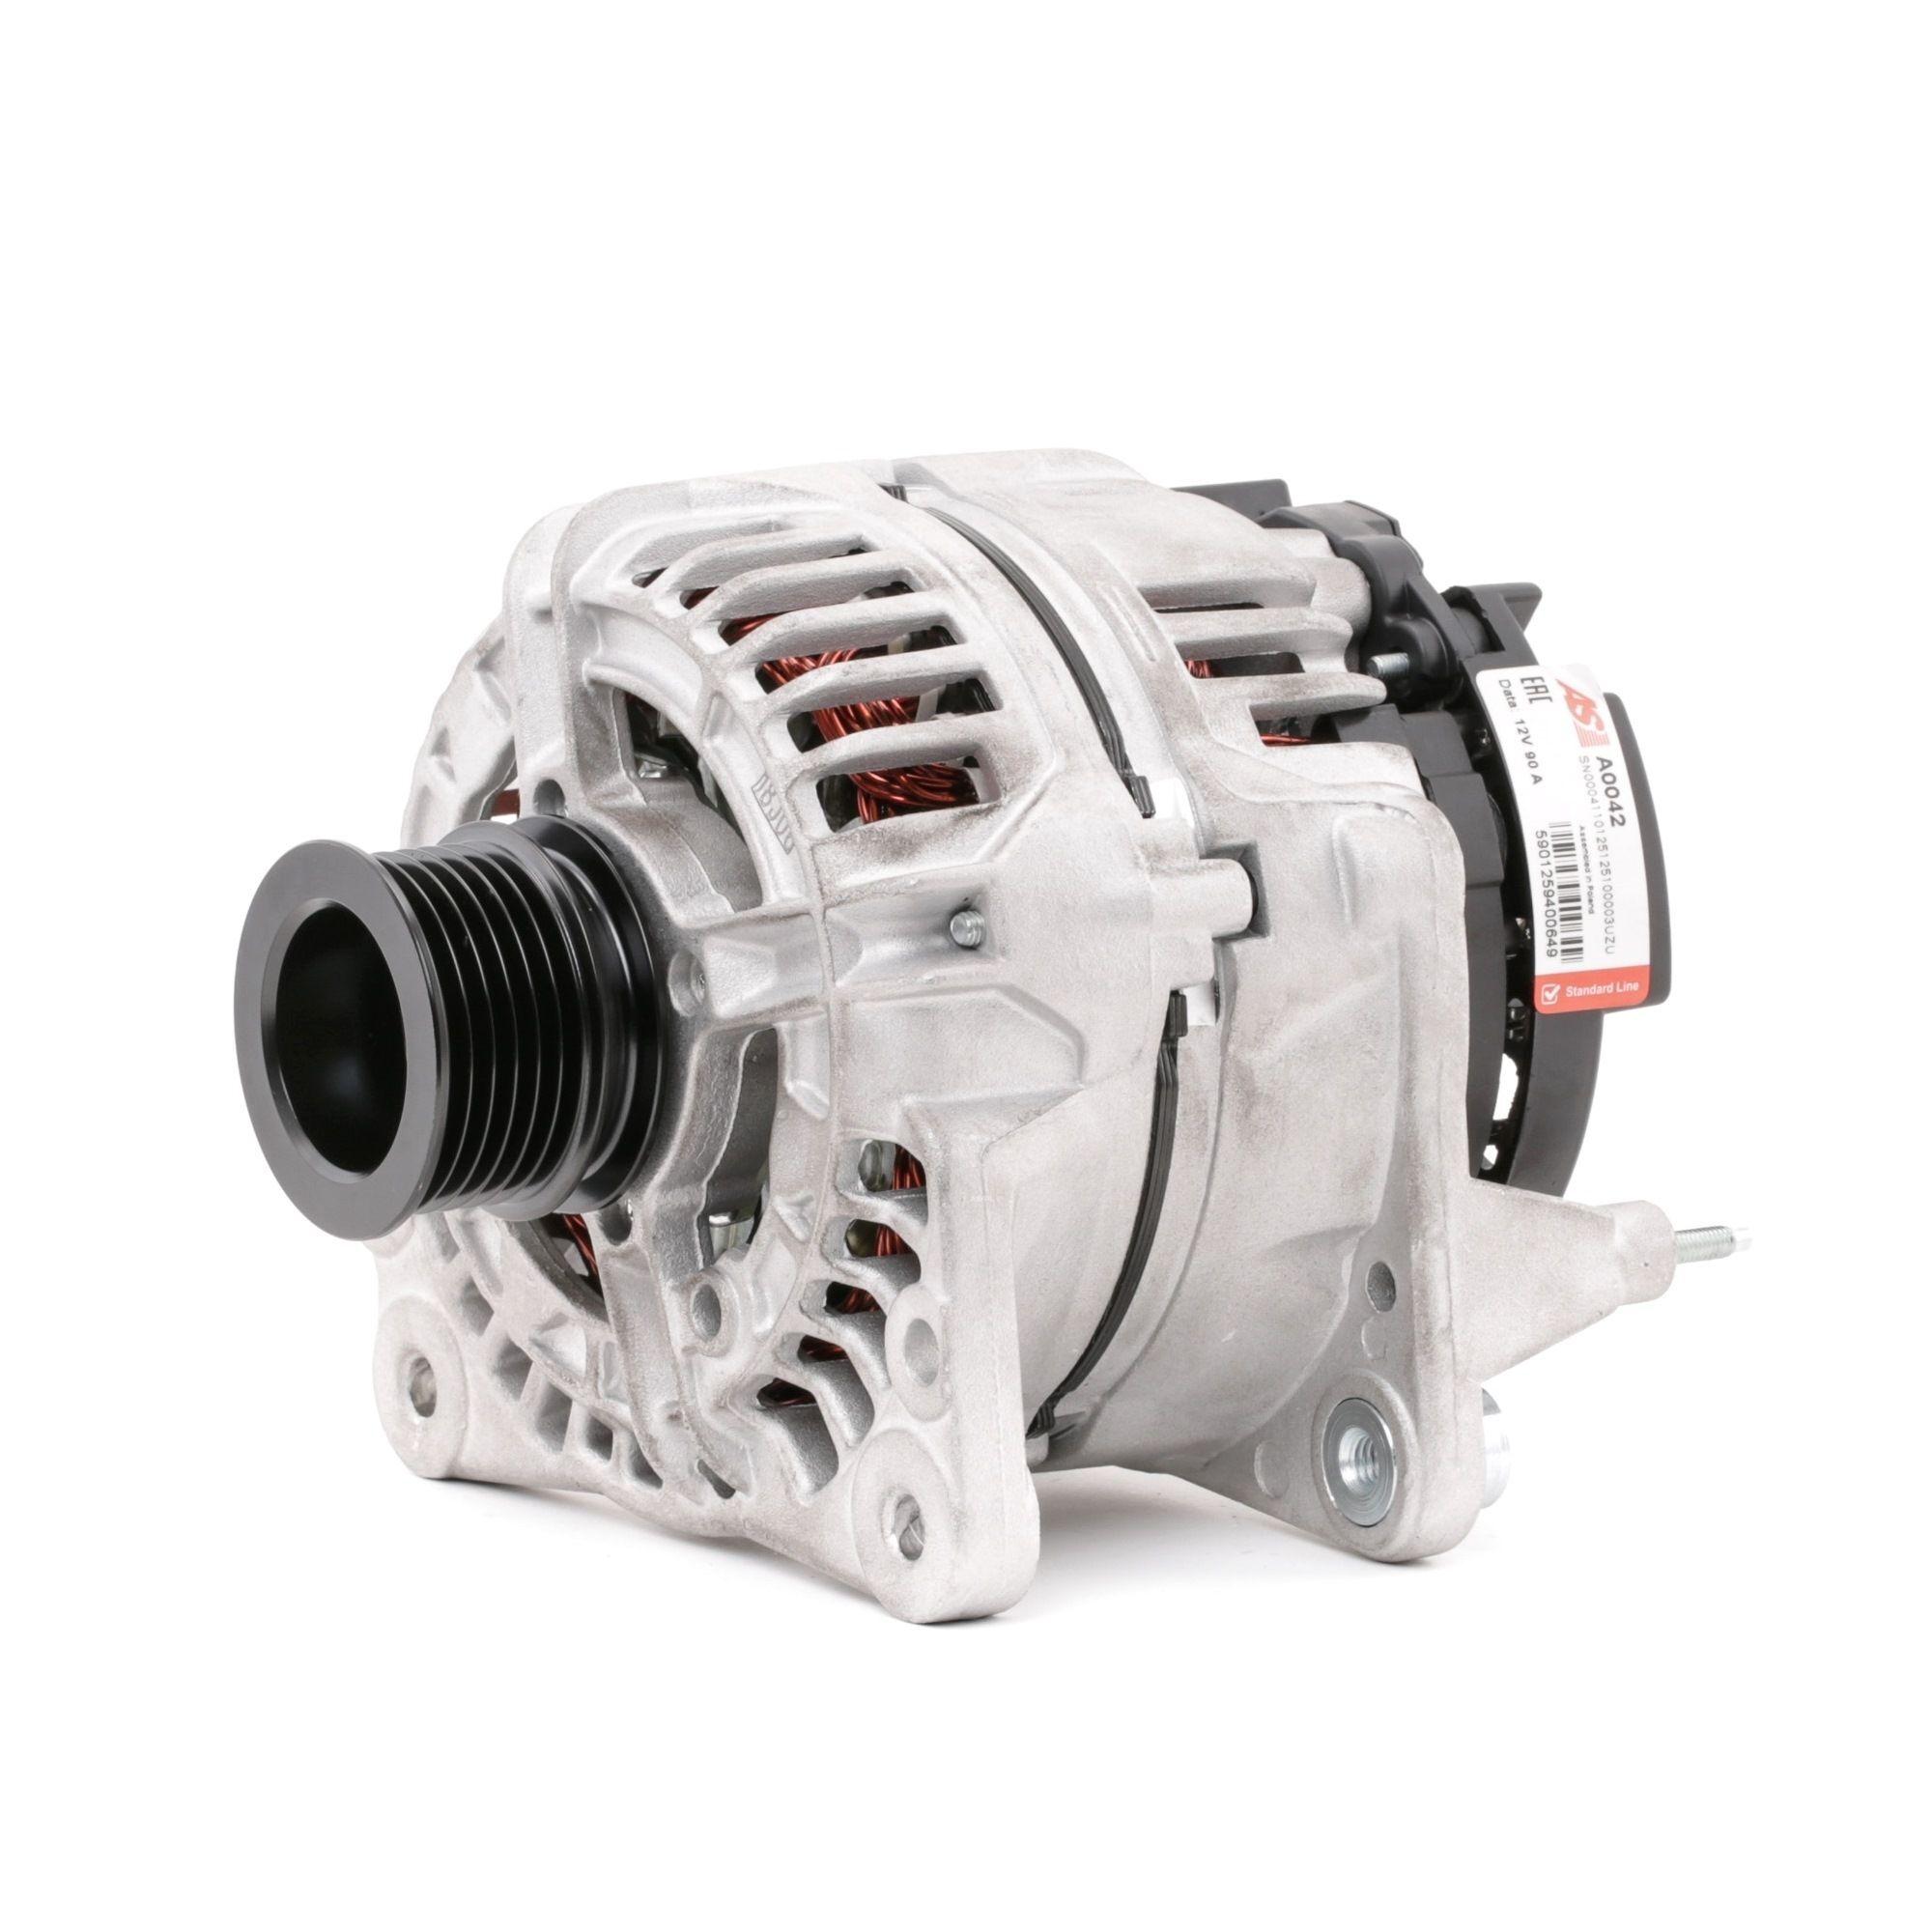 AS-PL Laturi Brand new AS-PL Alternator brush holder A0042 Generaattori AUDI,VW,OPEL,A3 8P1,A3 8L1,A3 Sportback 8PA,A4 8D2, B5,A4 Avant 8D5, B5,A2 8Z0